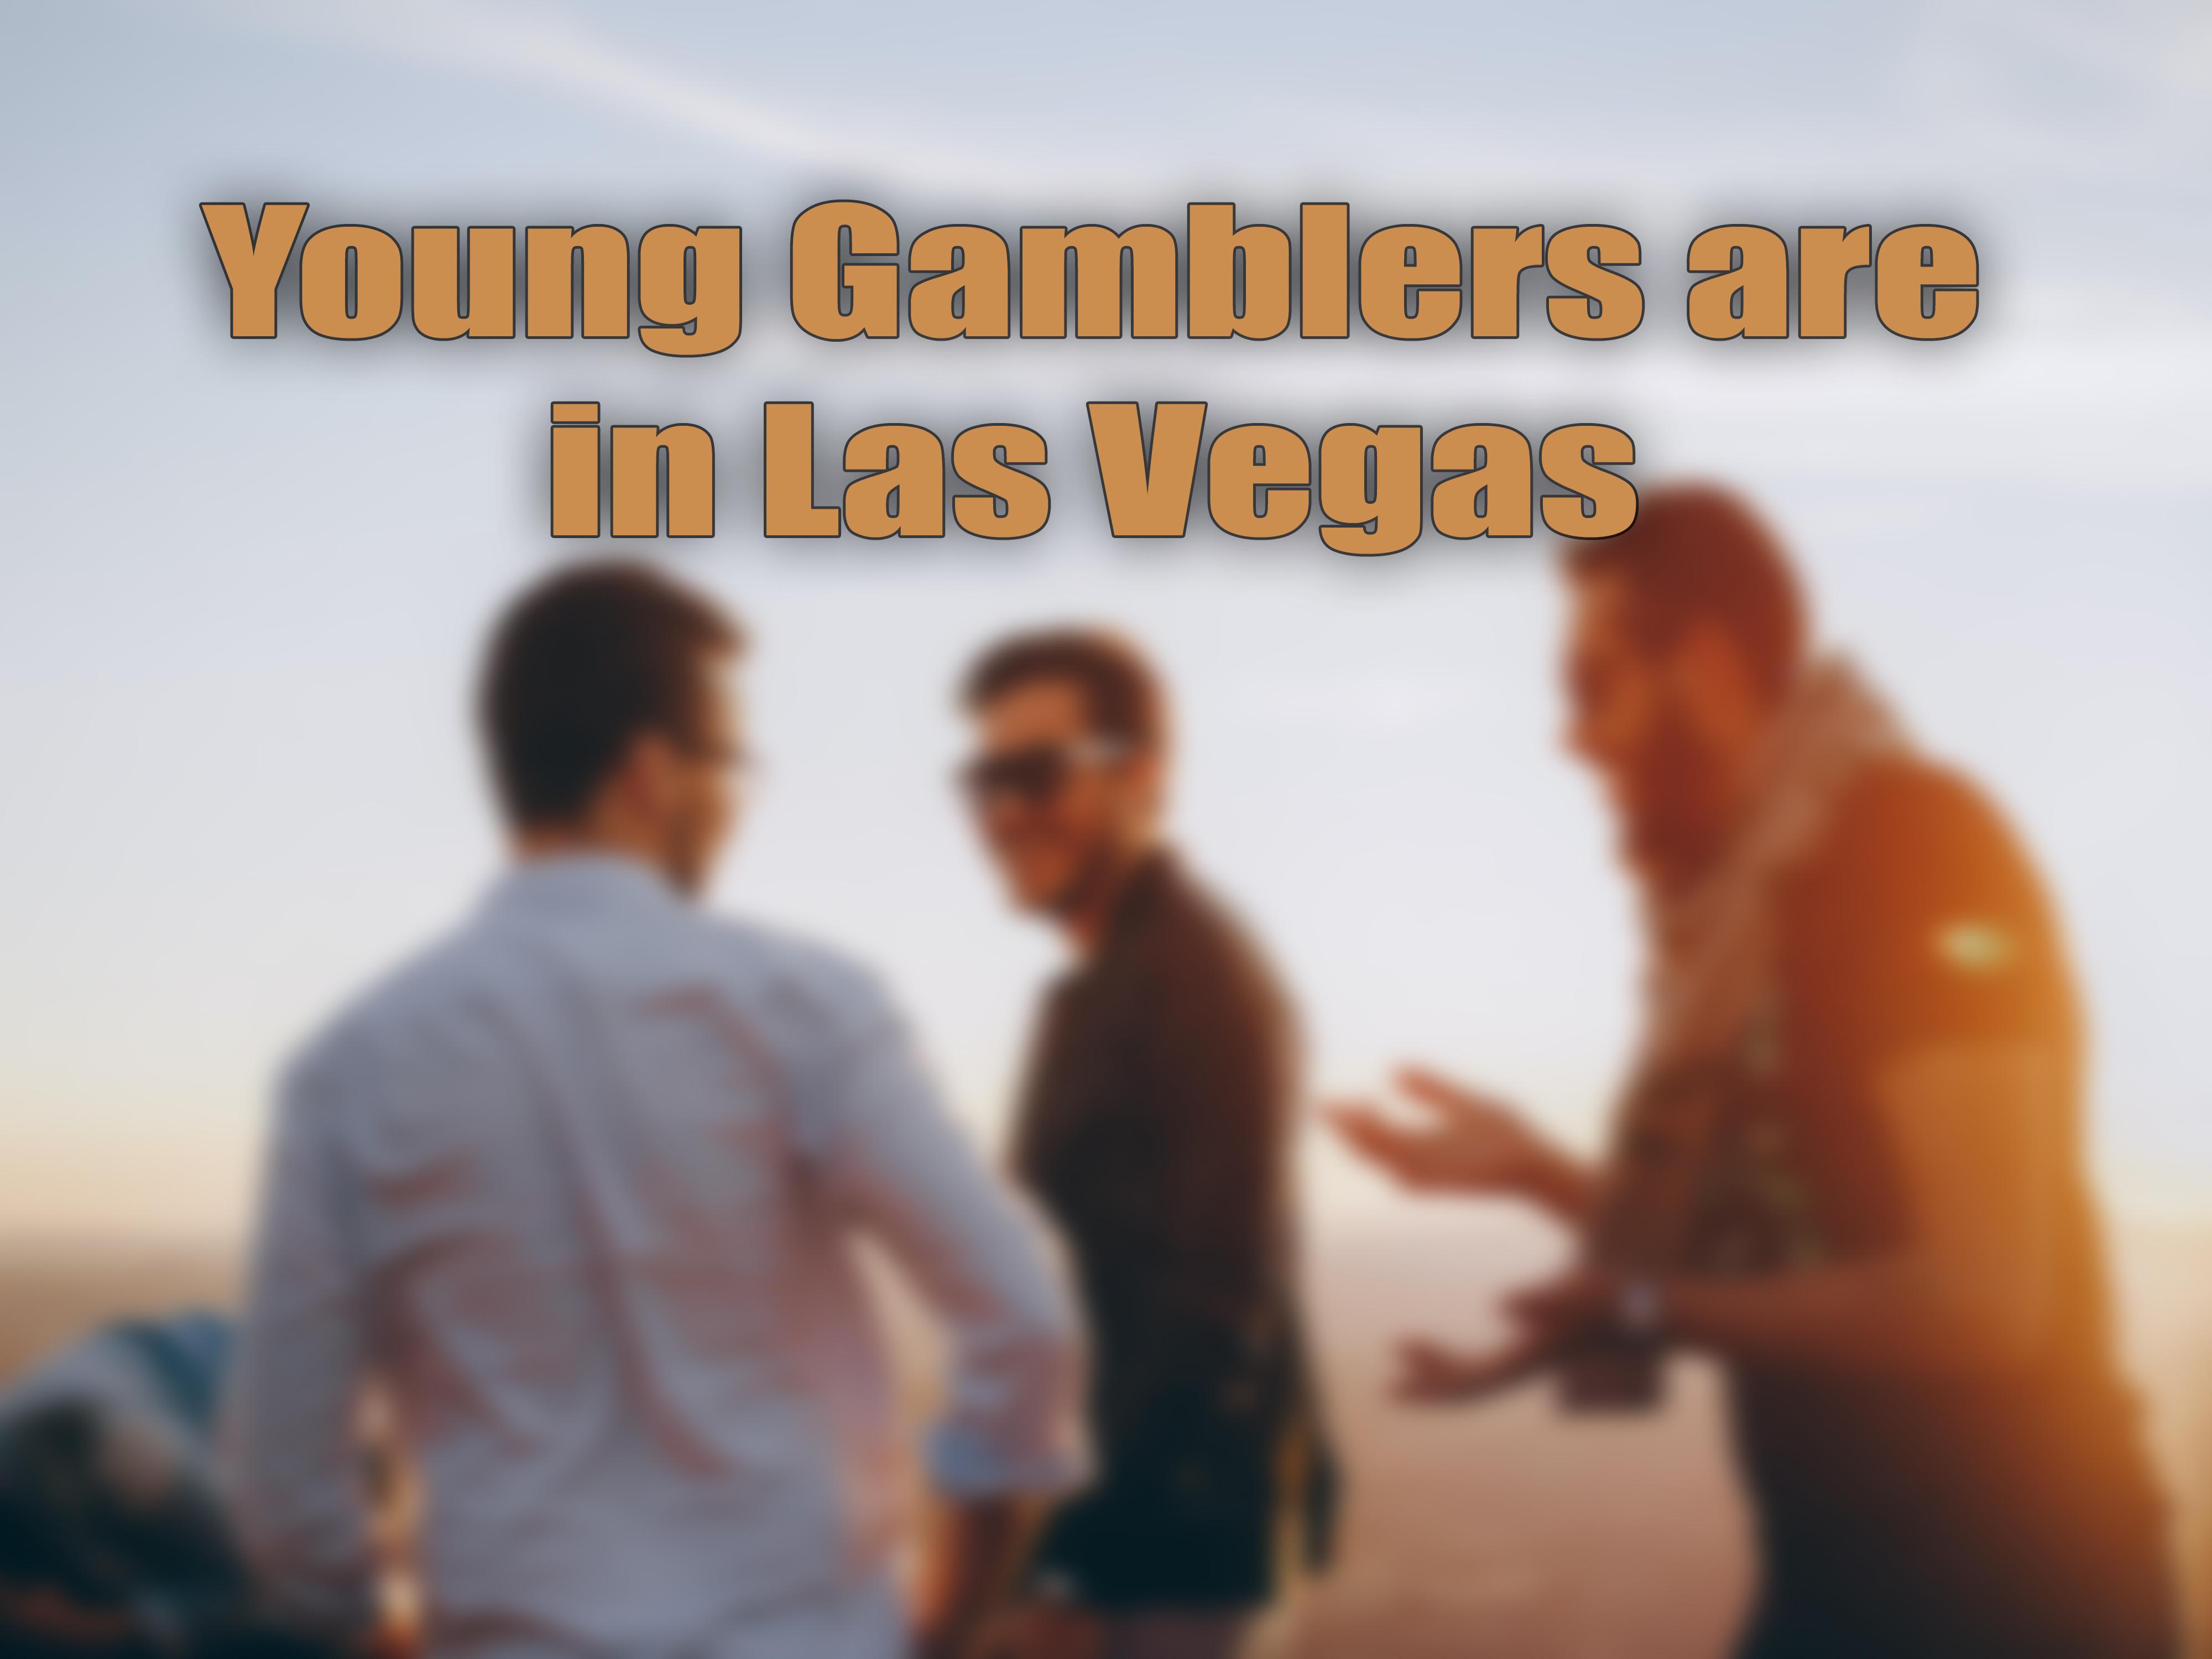 Young Gamblers in Las Vegas.jpg